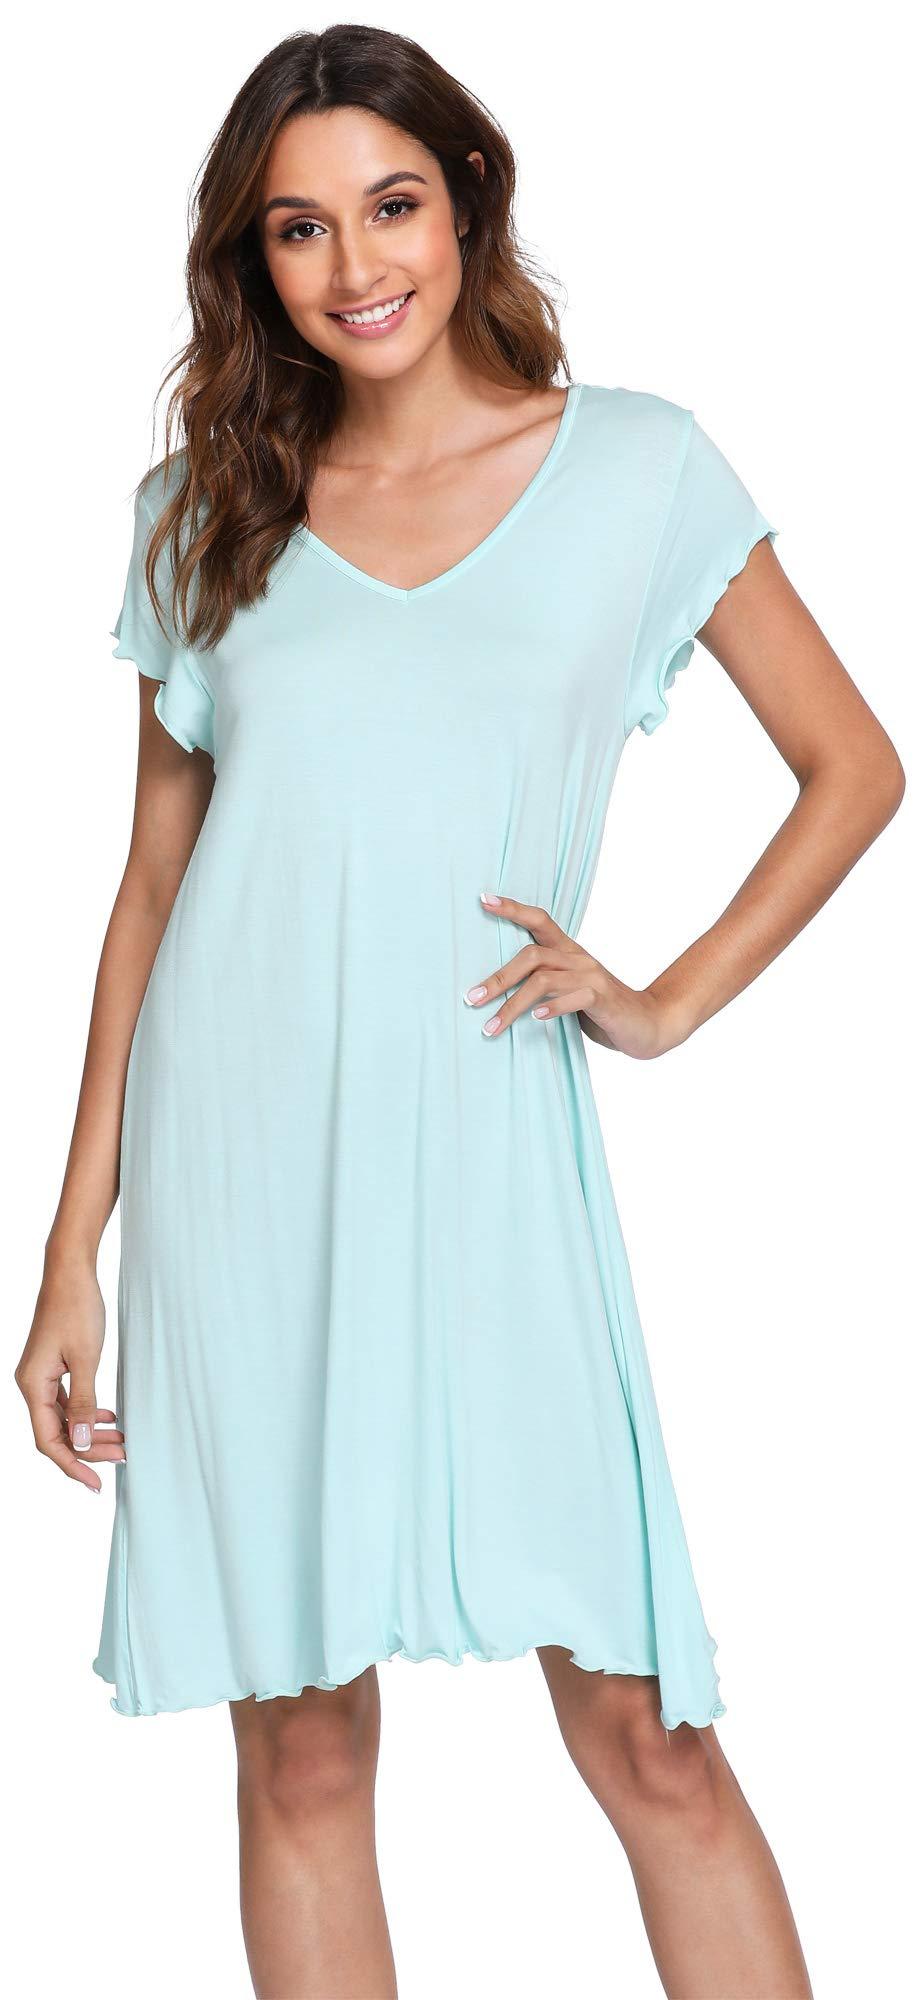 WiWi Women's Bamboo Soft Nightgown Sleepwear Short Sleeves Lightweight Nightwear Plus Size Sleep Shirts S-4X